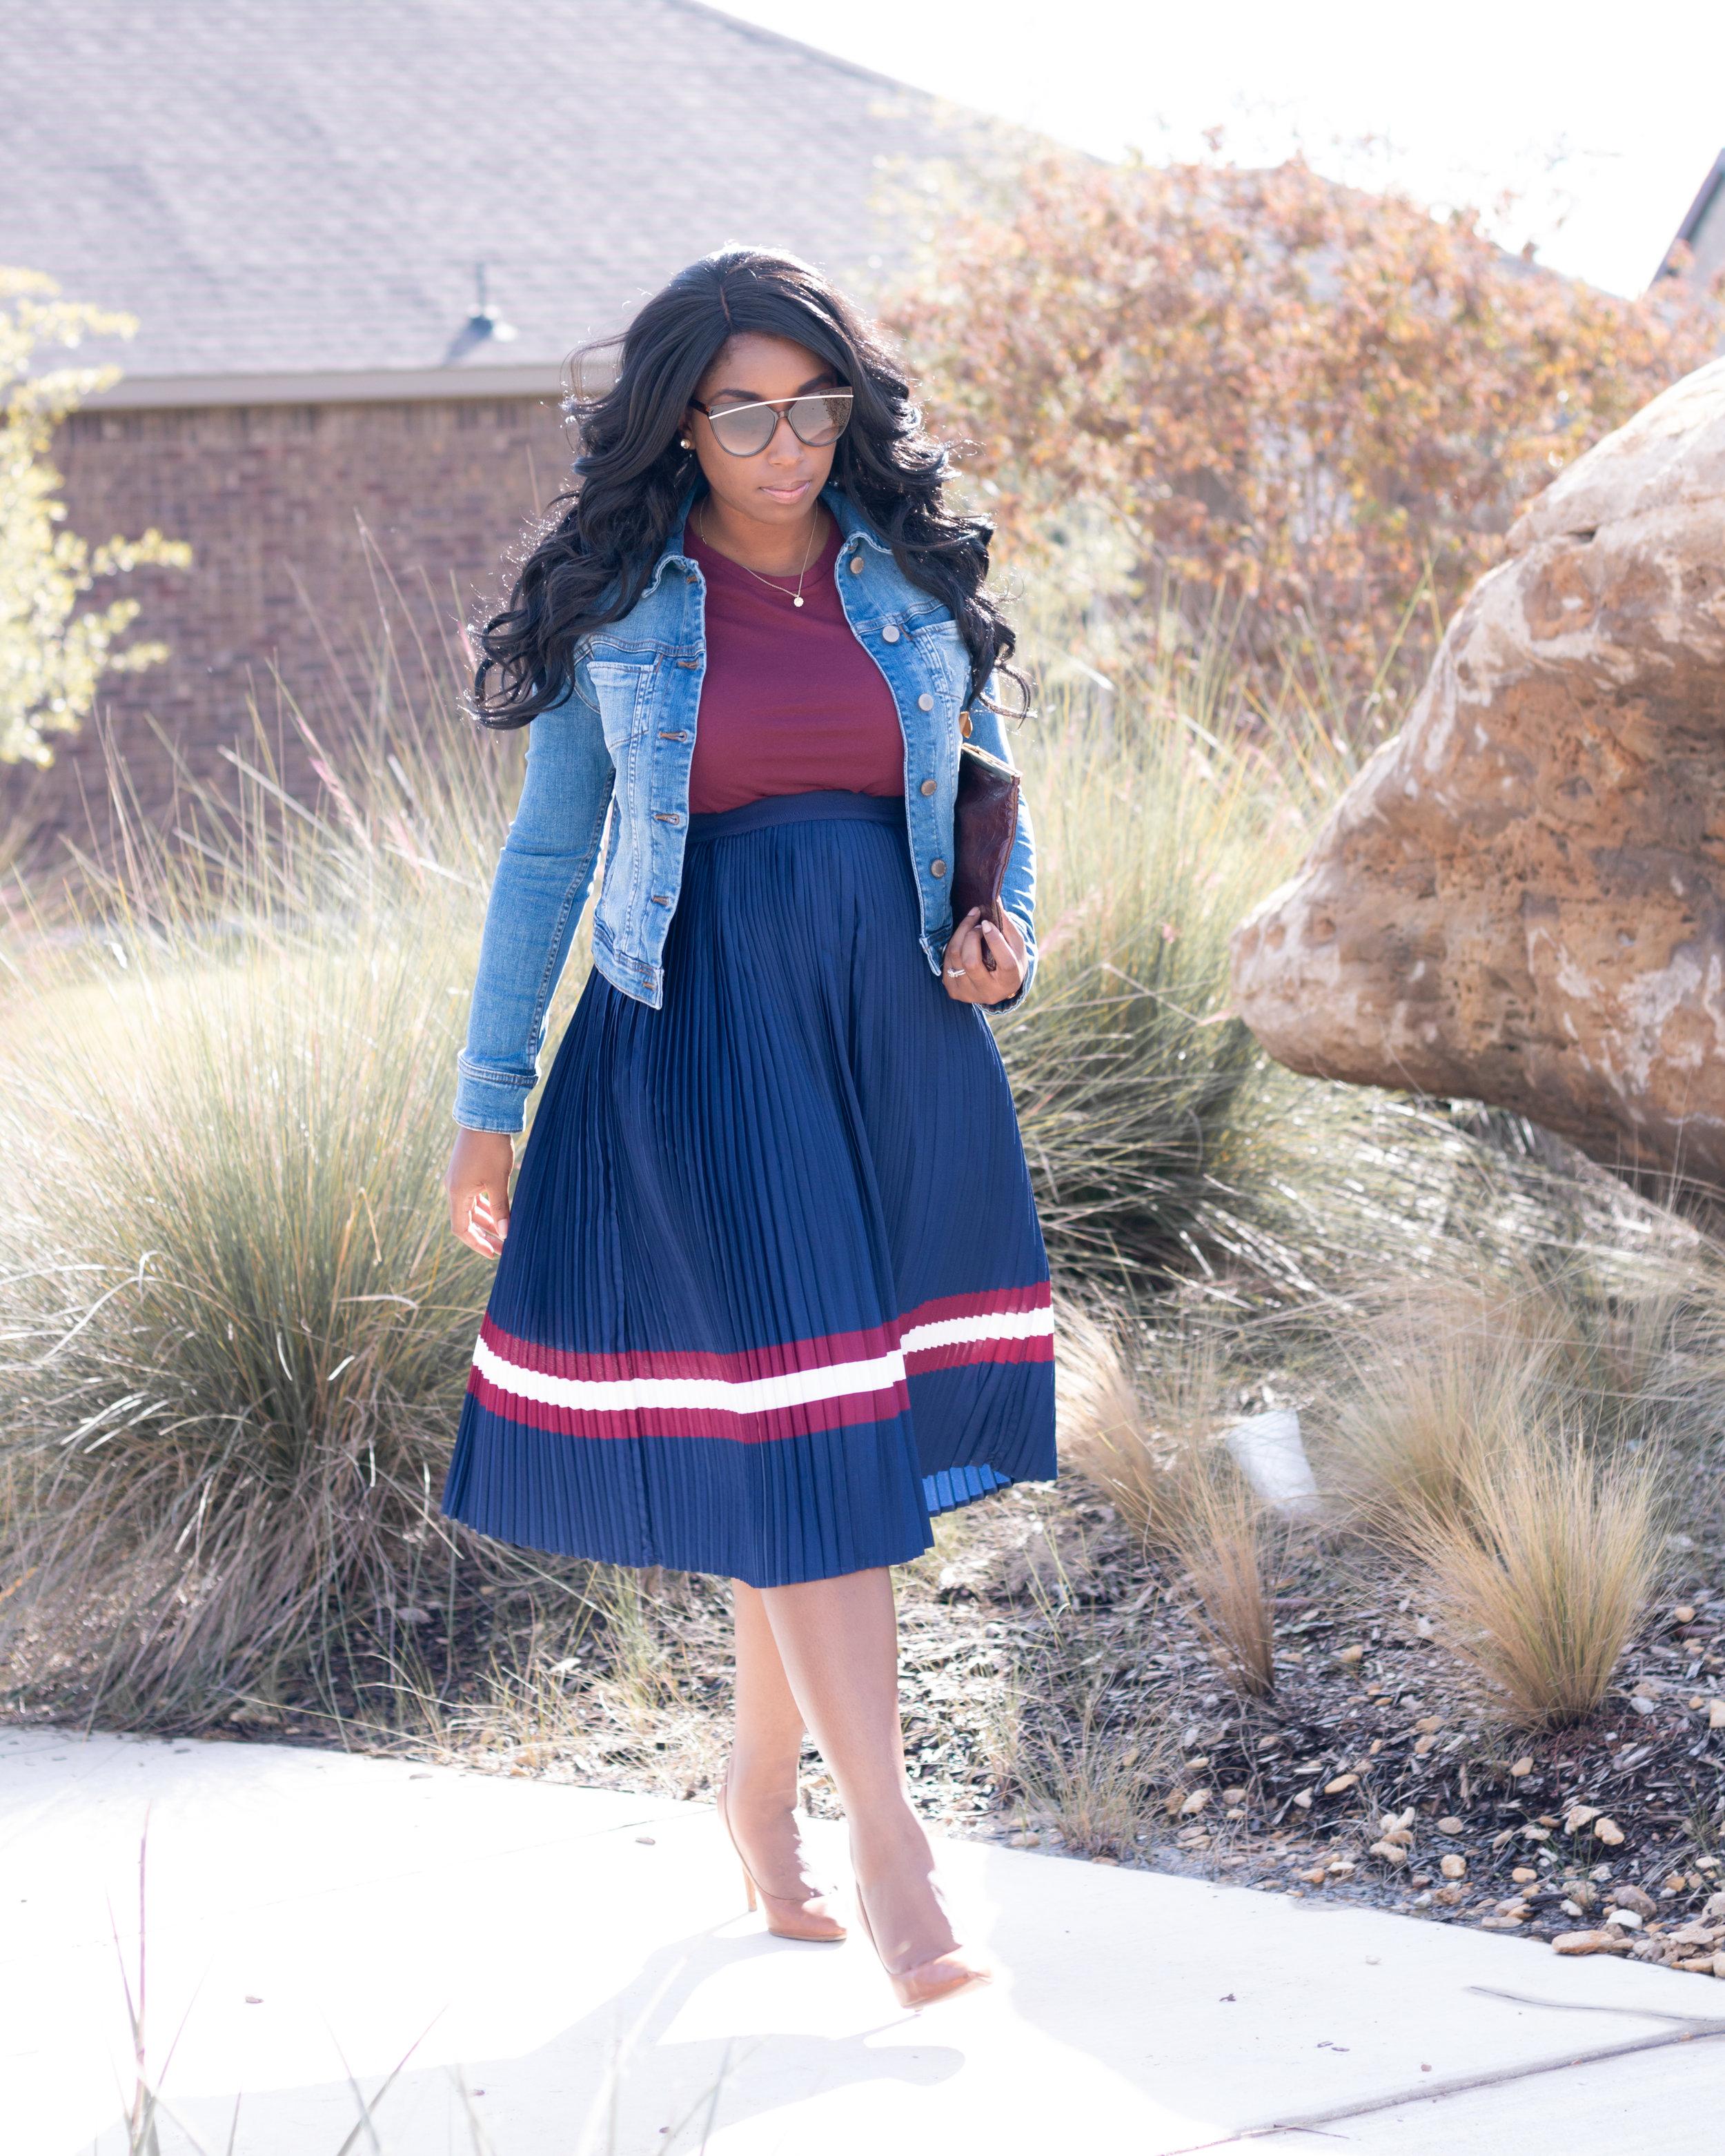 kroger-dip-clothing-for-work-school-activewear